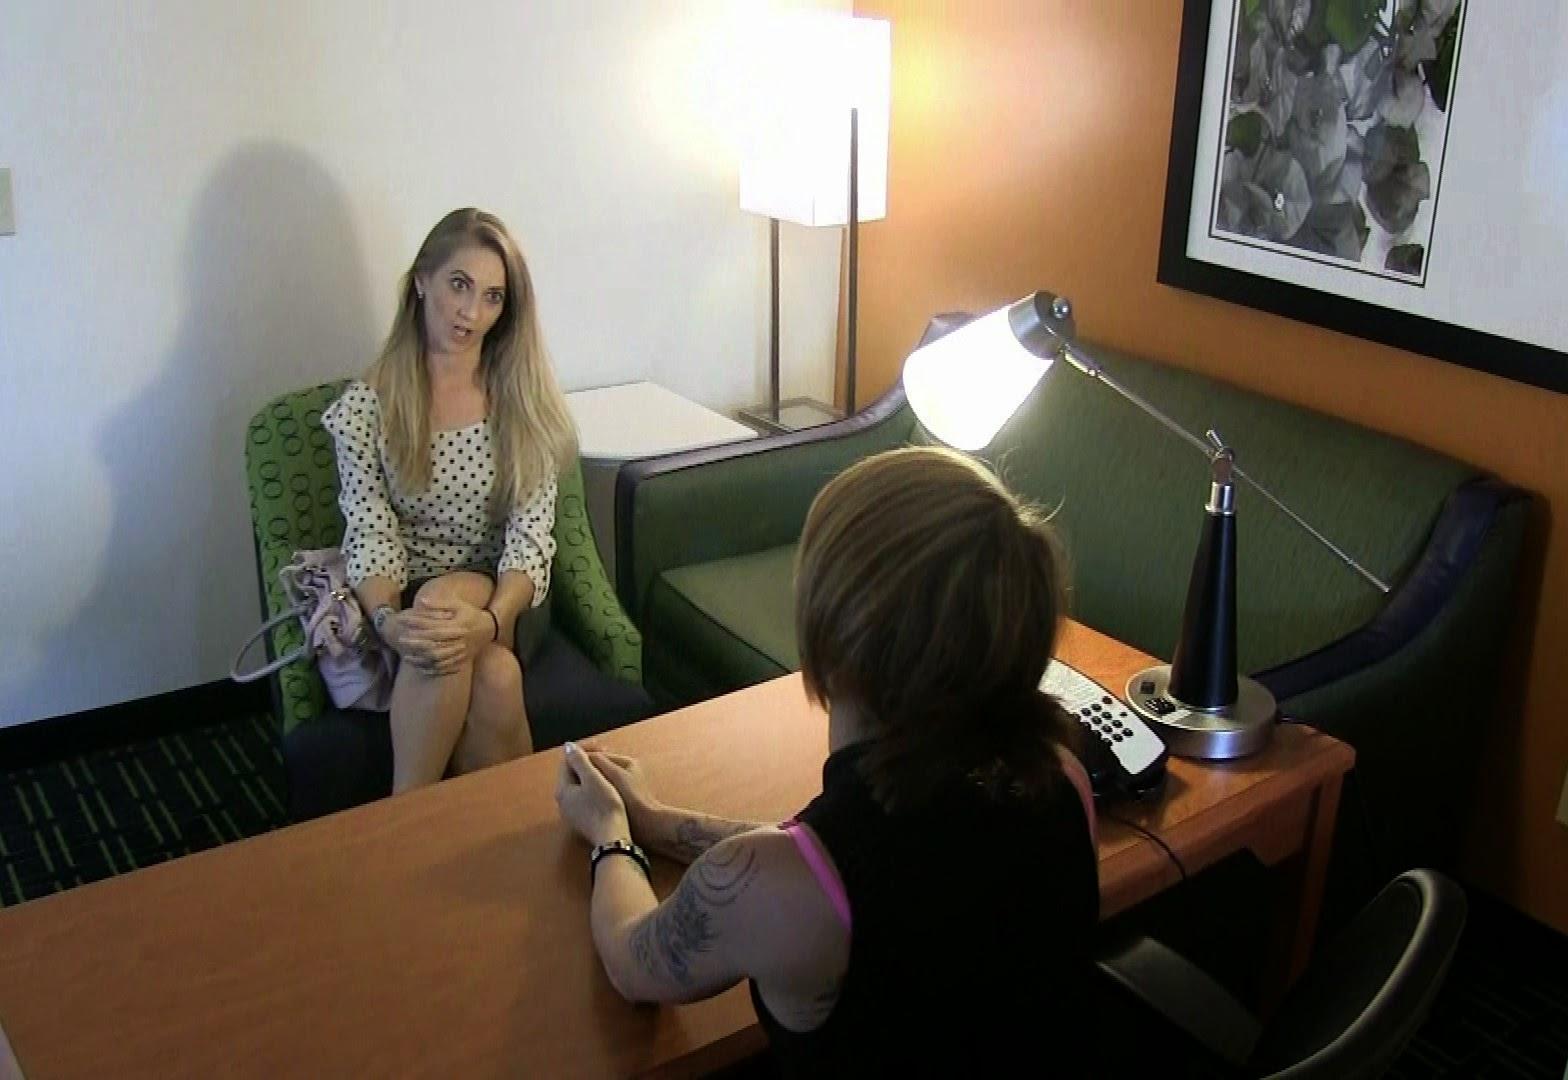 Fetish Auteur Bek Stripped Naked At Job Interview-2623